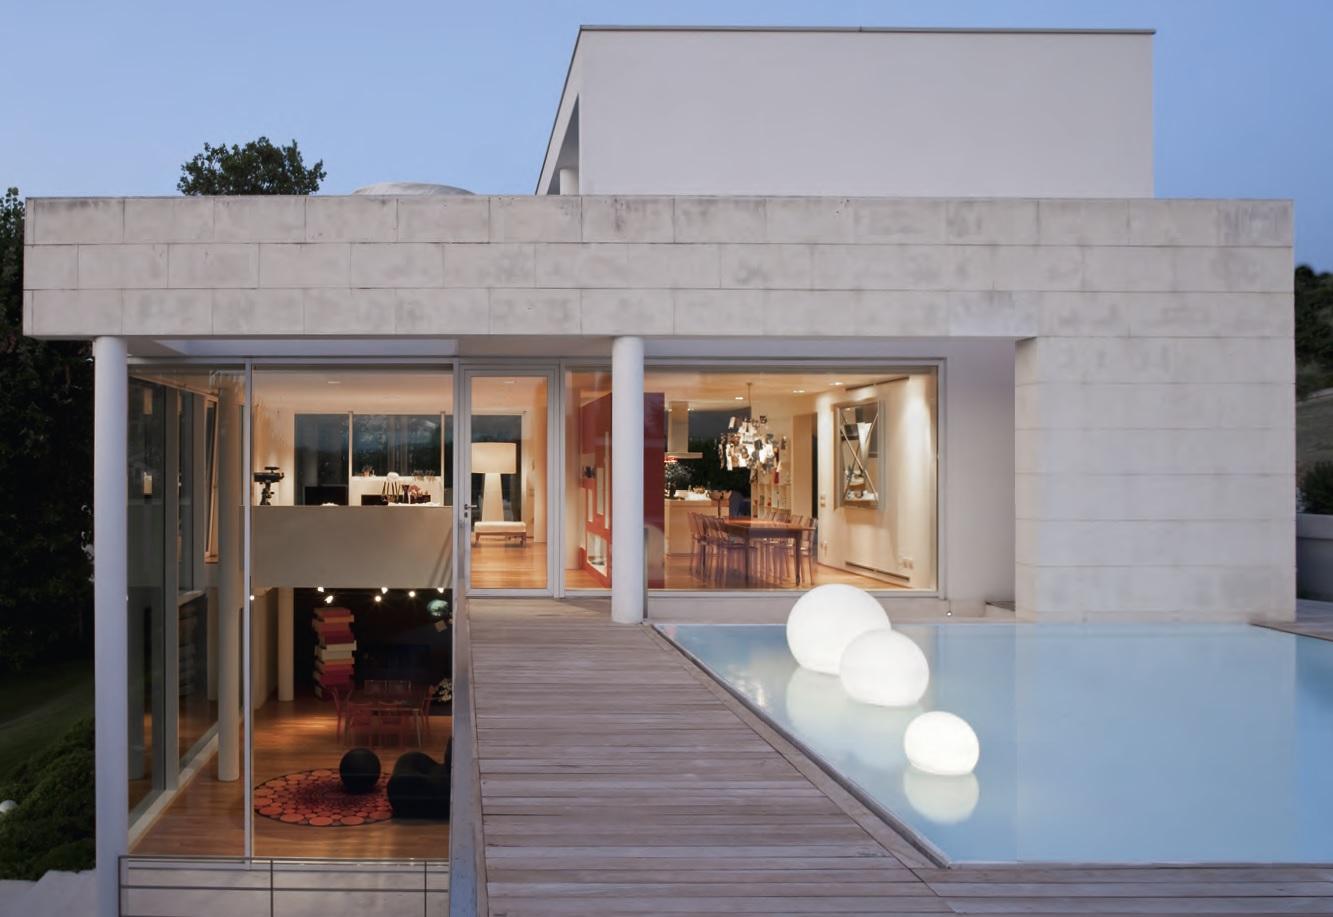 Costruire una casa un progetto di libert ville casali - Costruire una casa ...